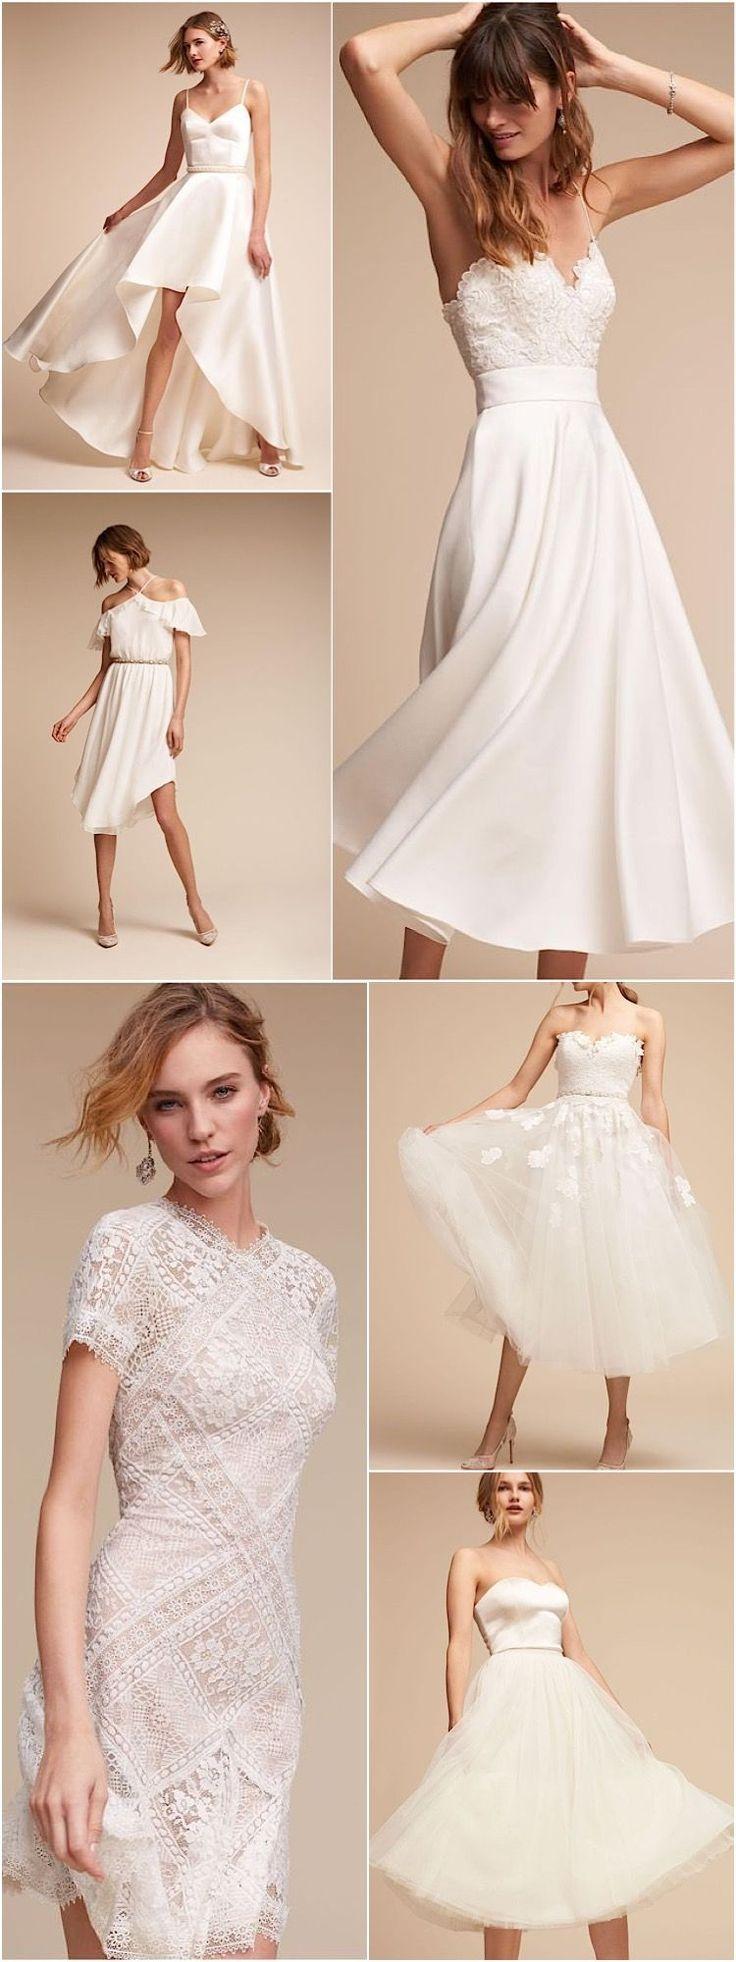 Randy fenoli wedding dresses   best Wedding Stuff images on Pinterest  Wedding frocks Wedding